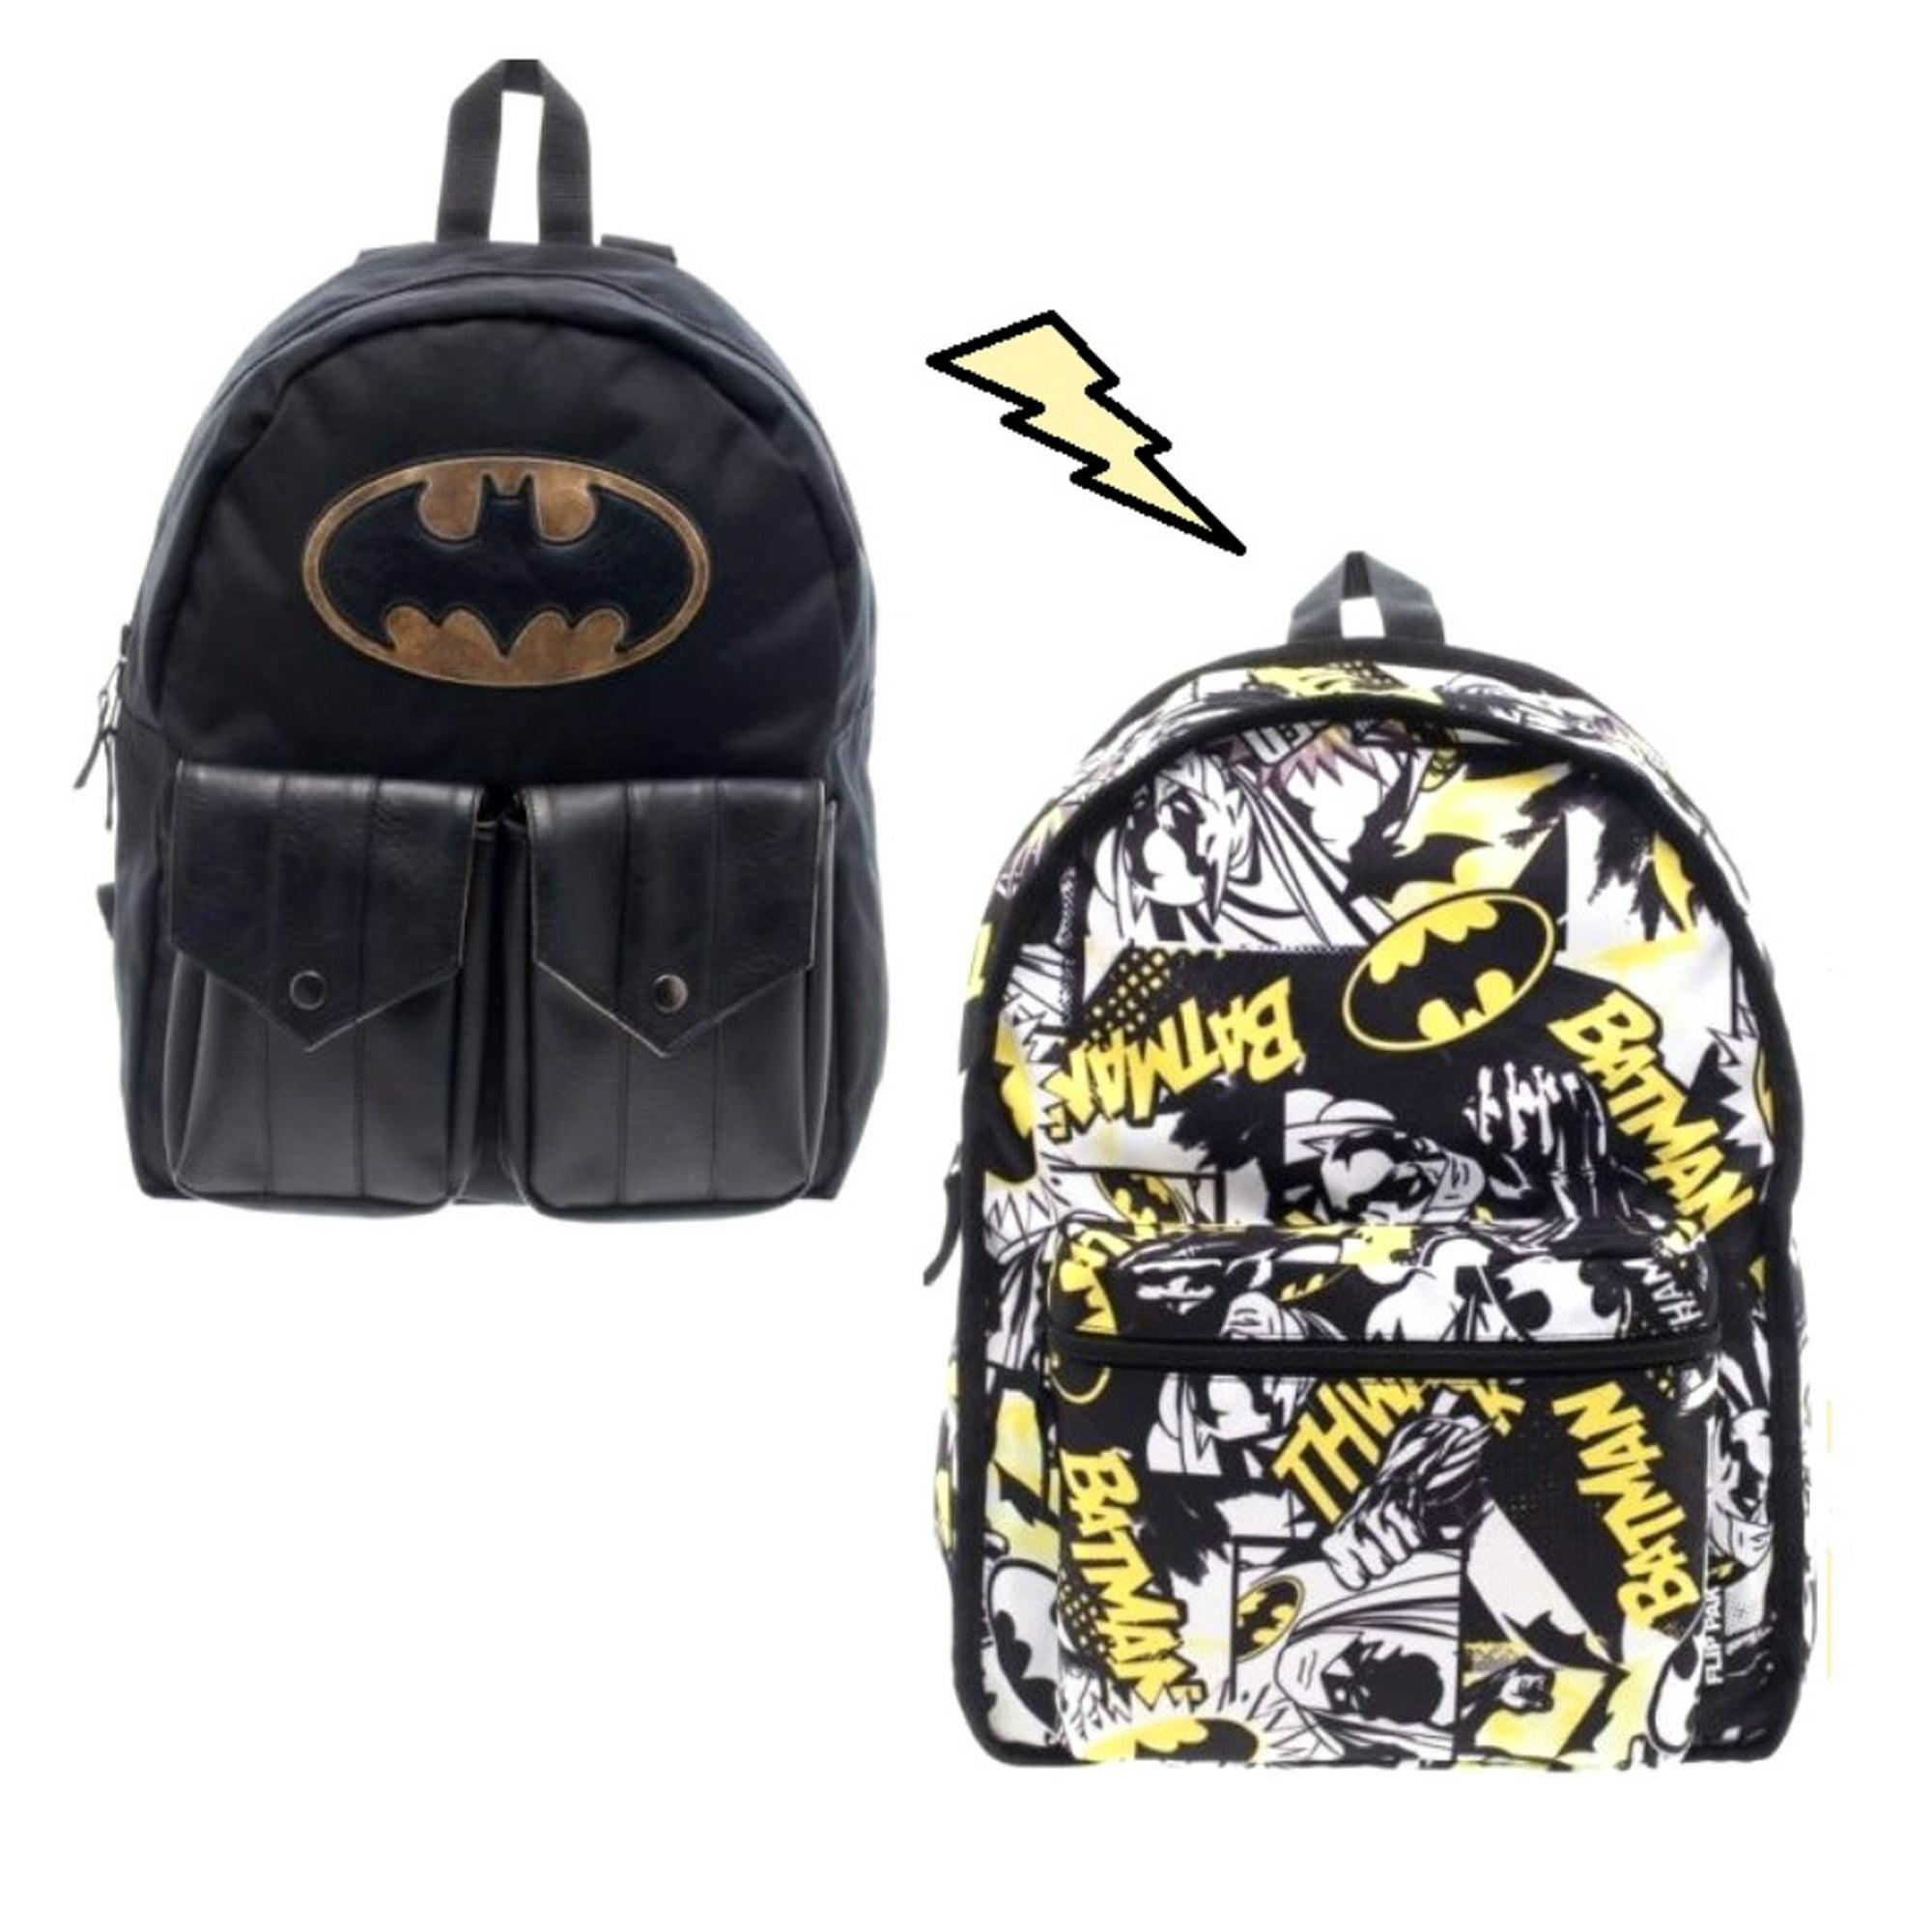 Dc Comics Batman Licensed Reversible Backpack With Pockets Black School Book Bag